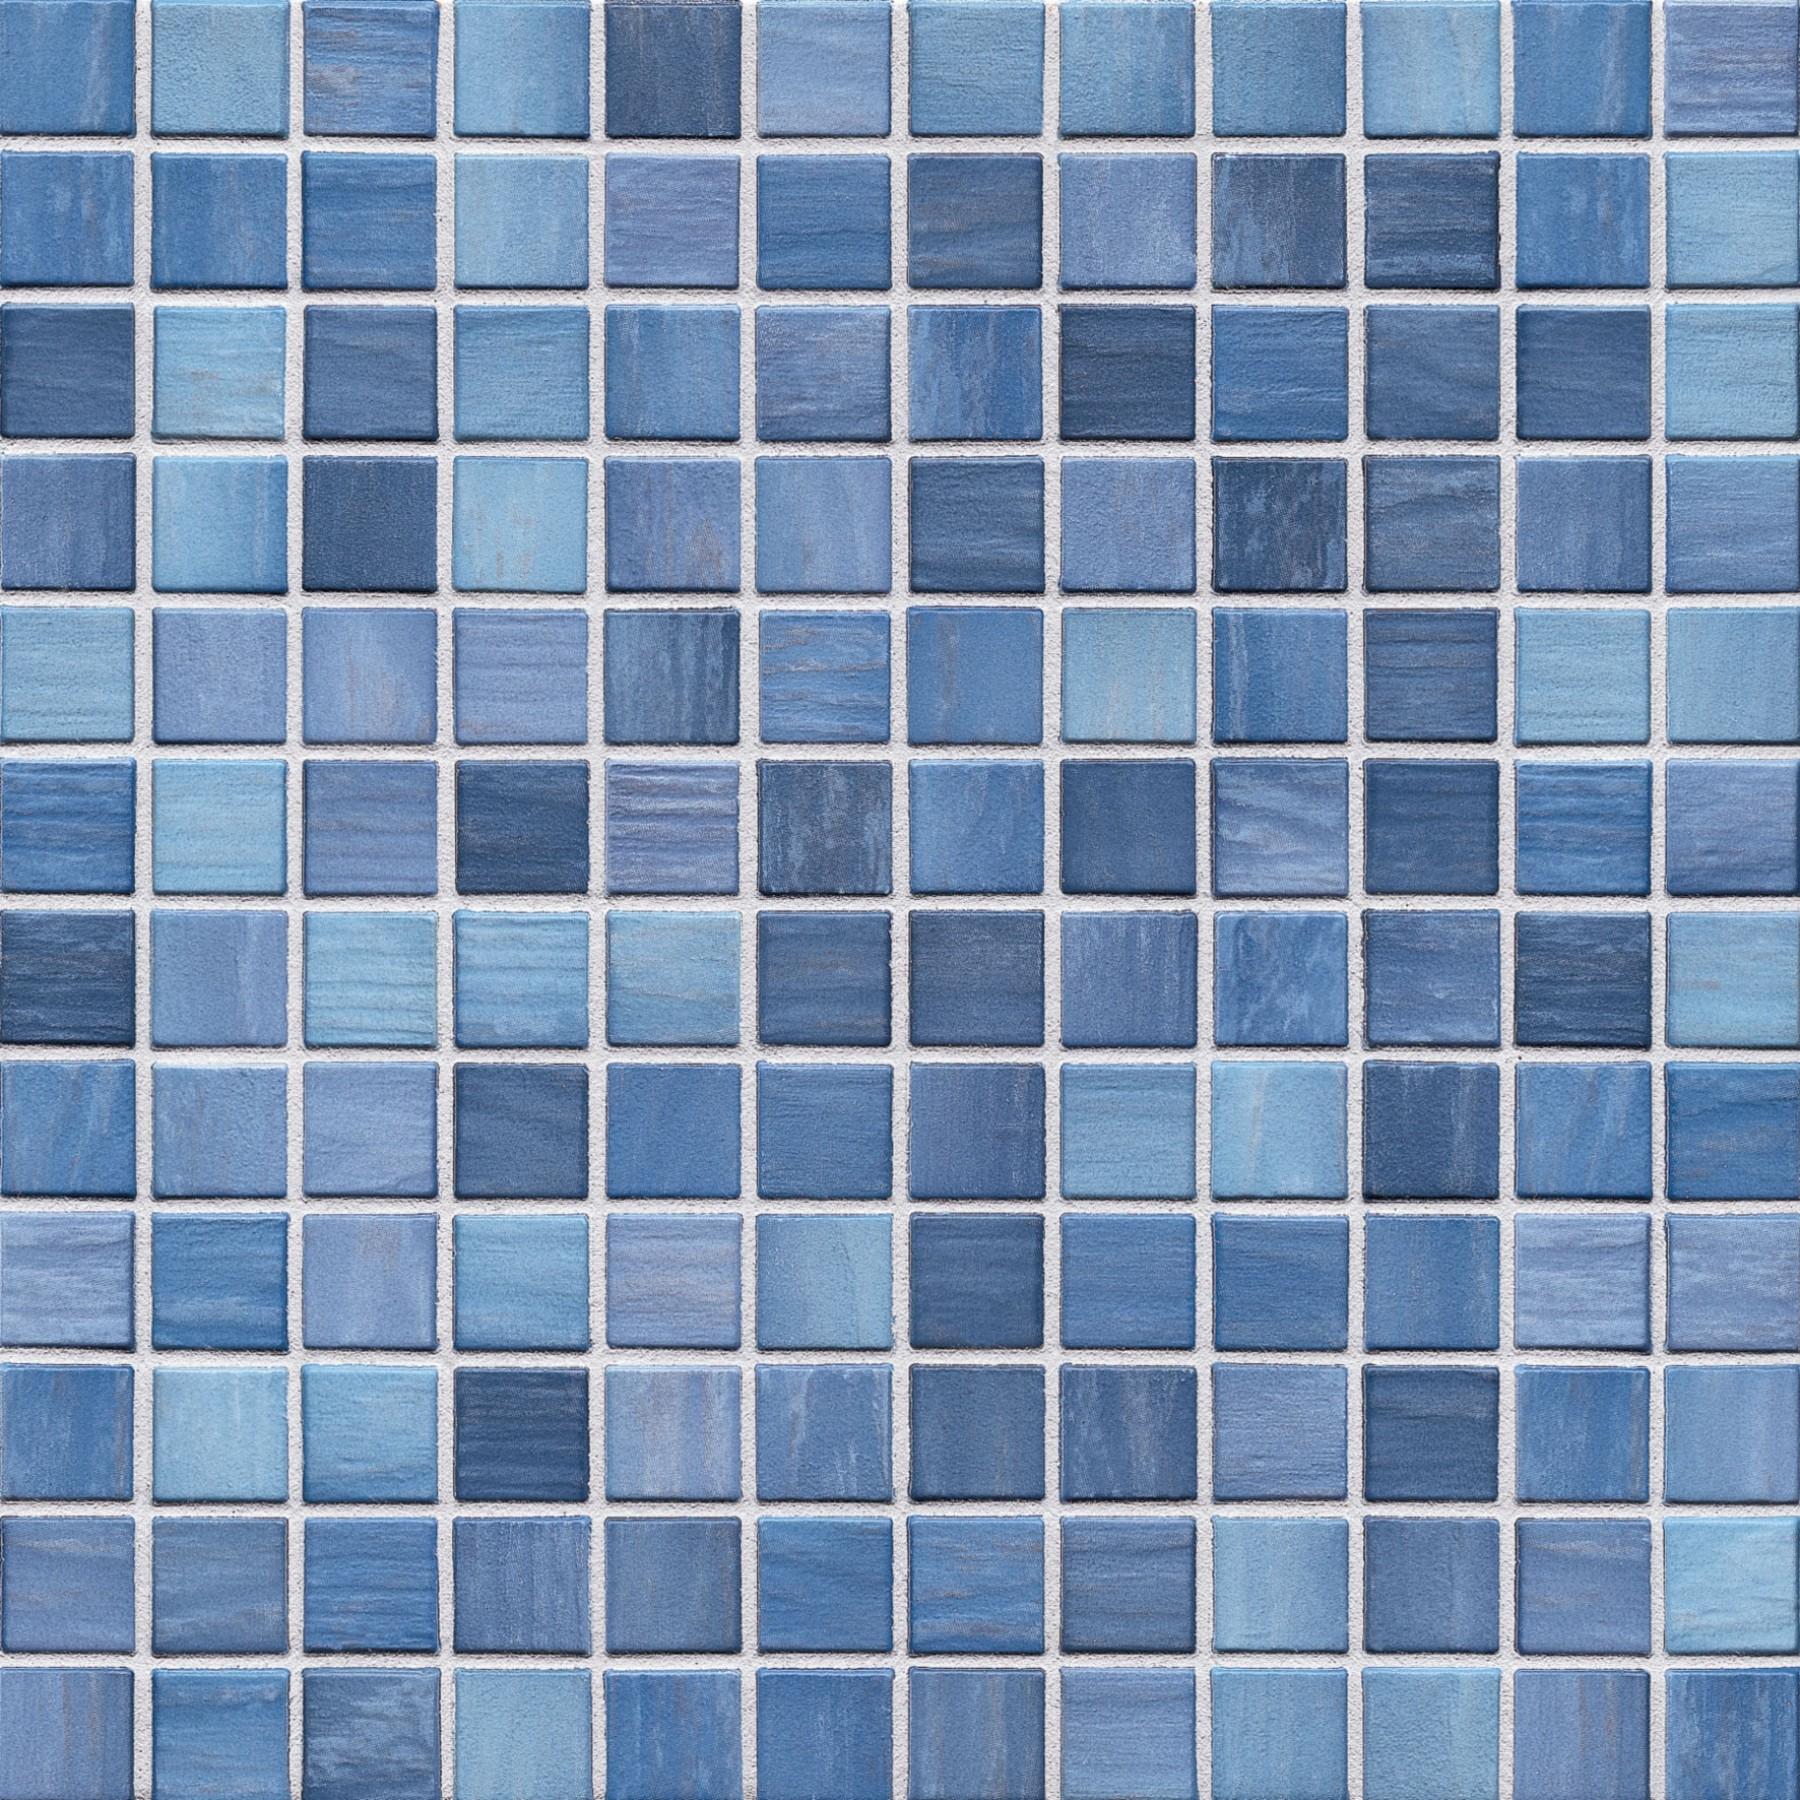 Jasba Homing blueberry-mix 24x24x6.5 mm 6743H